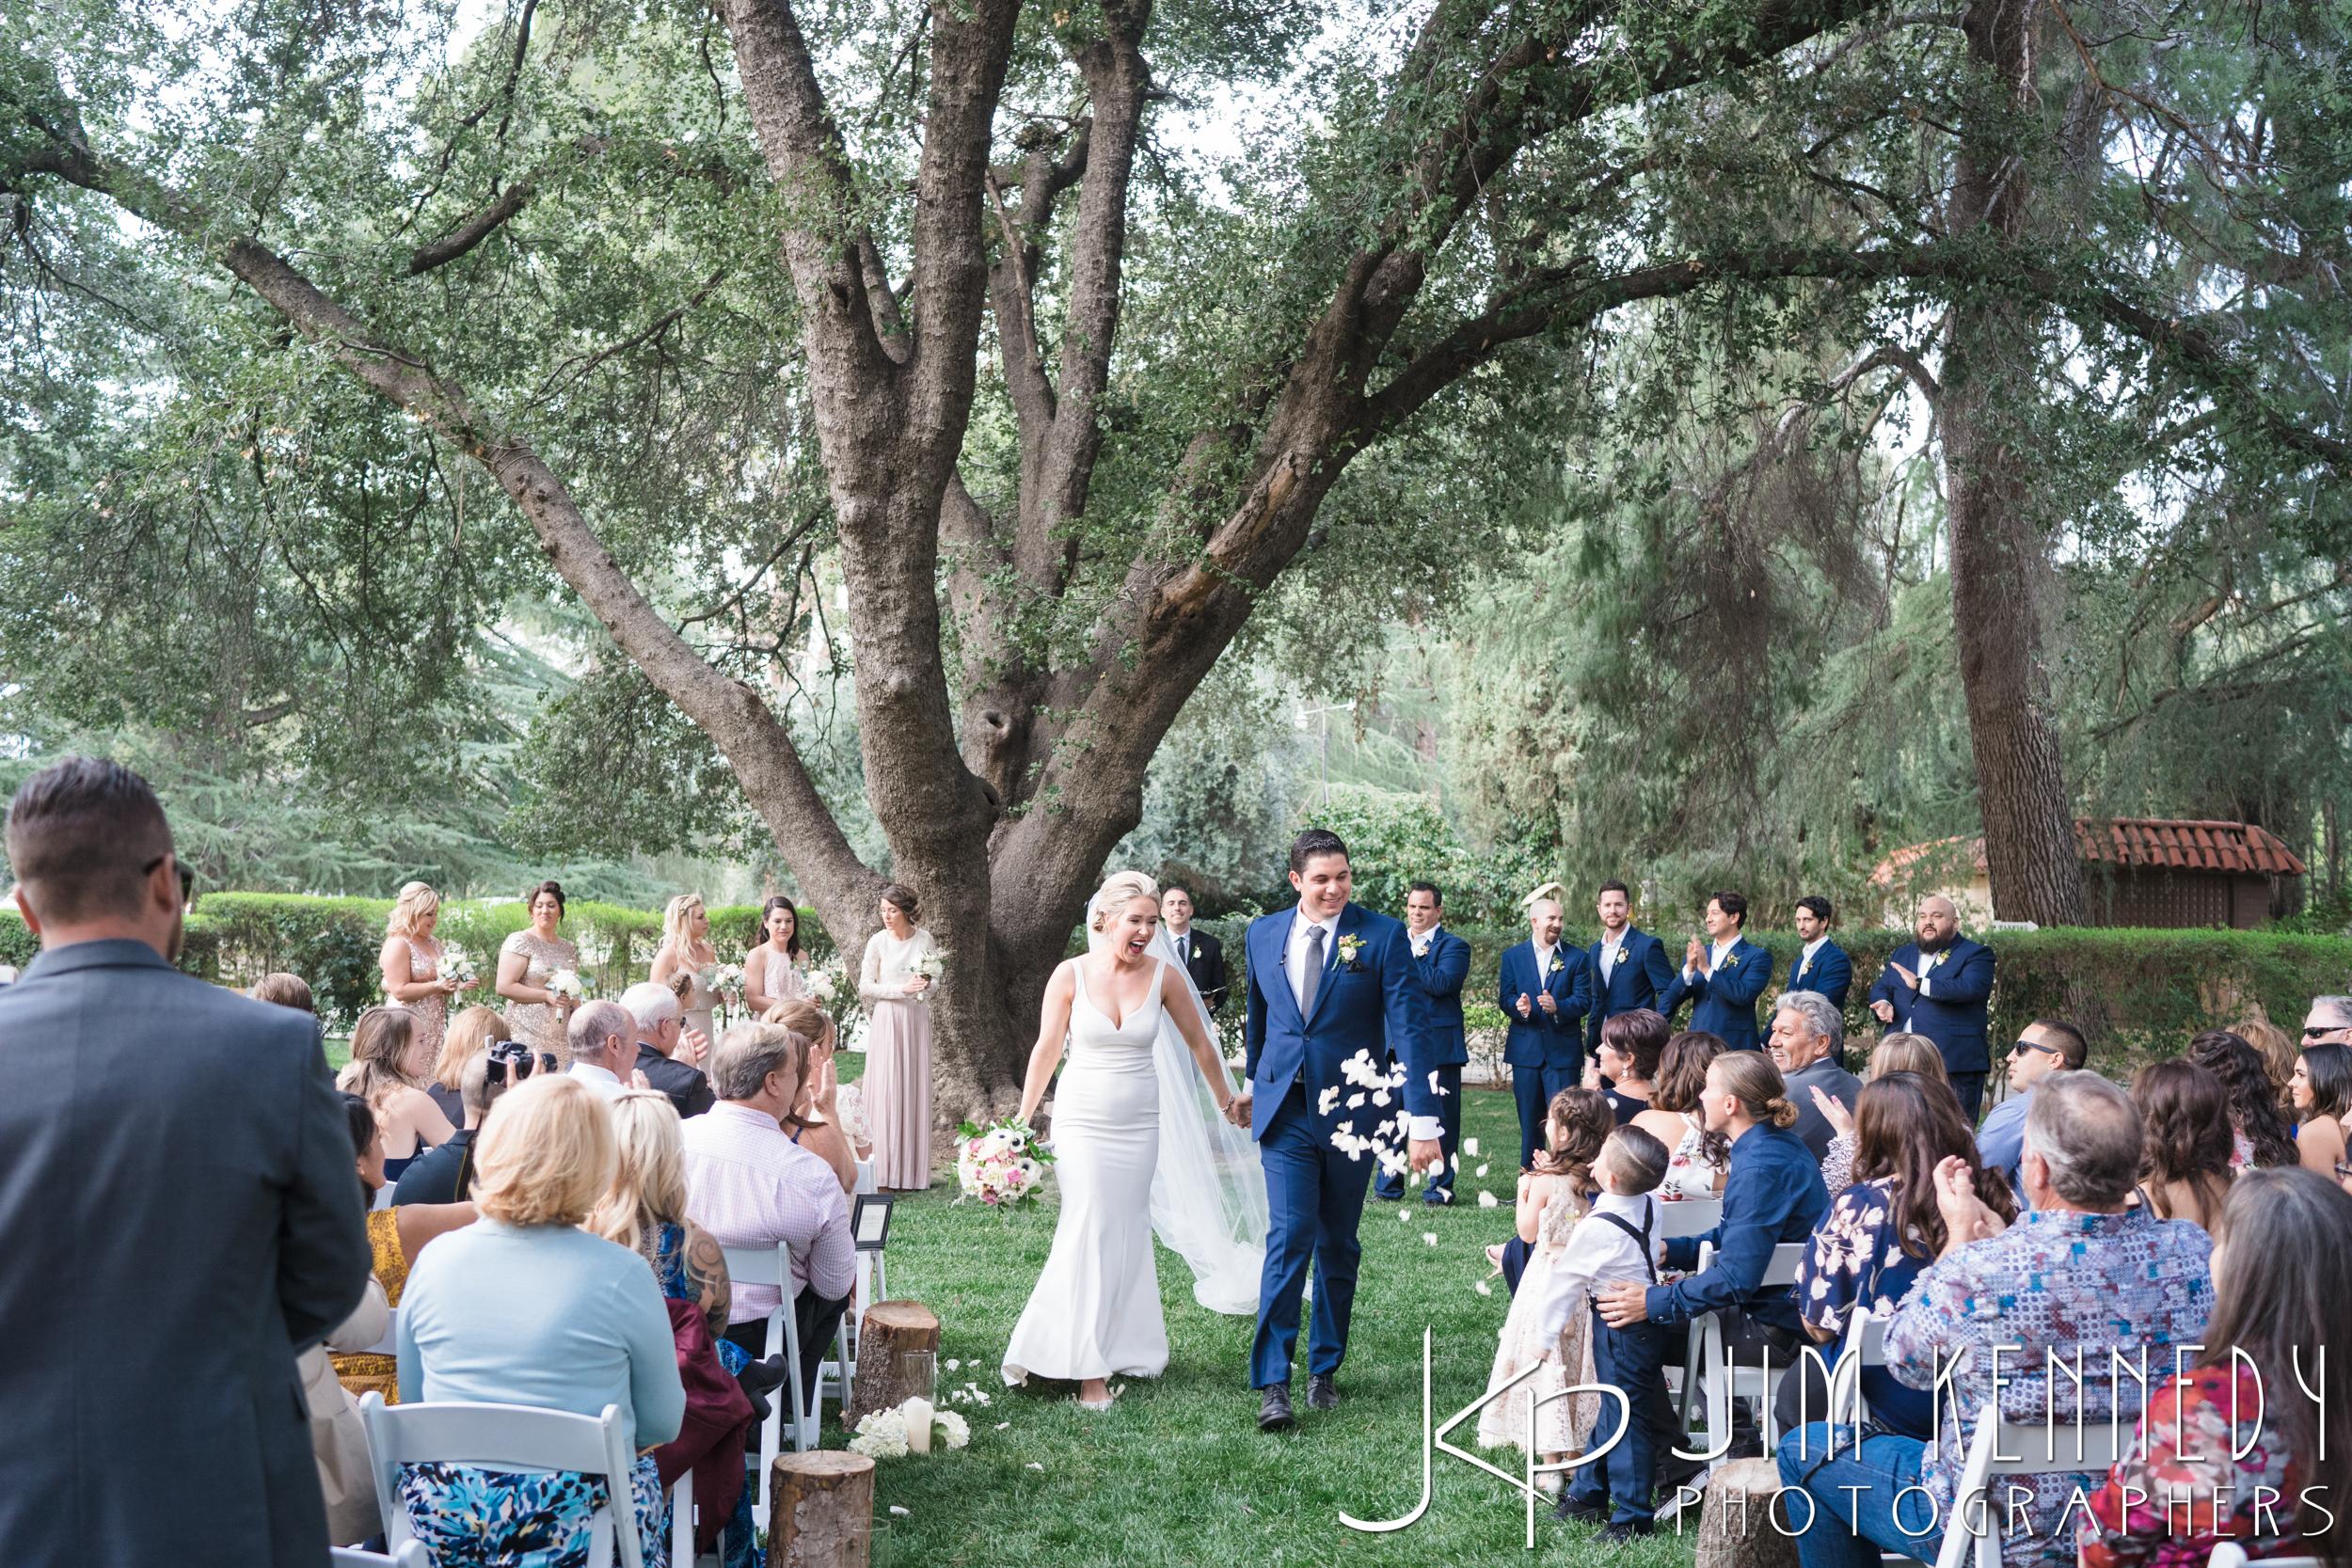 jim_kennedy_photographers_highland_springs_wedding_caitlyn_0124.jpg